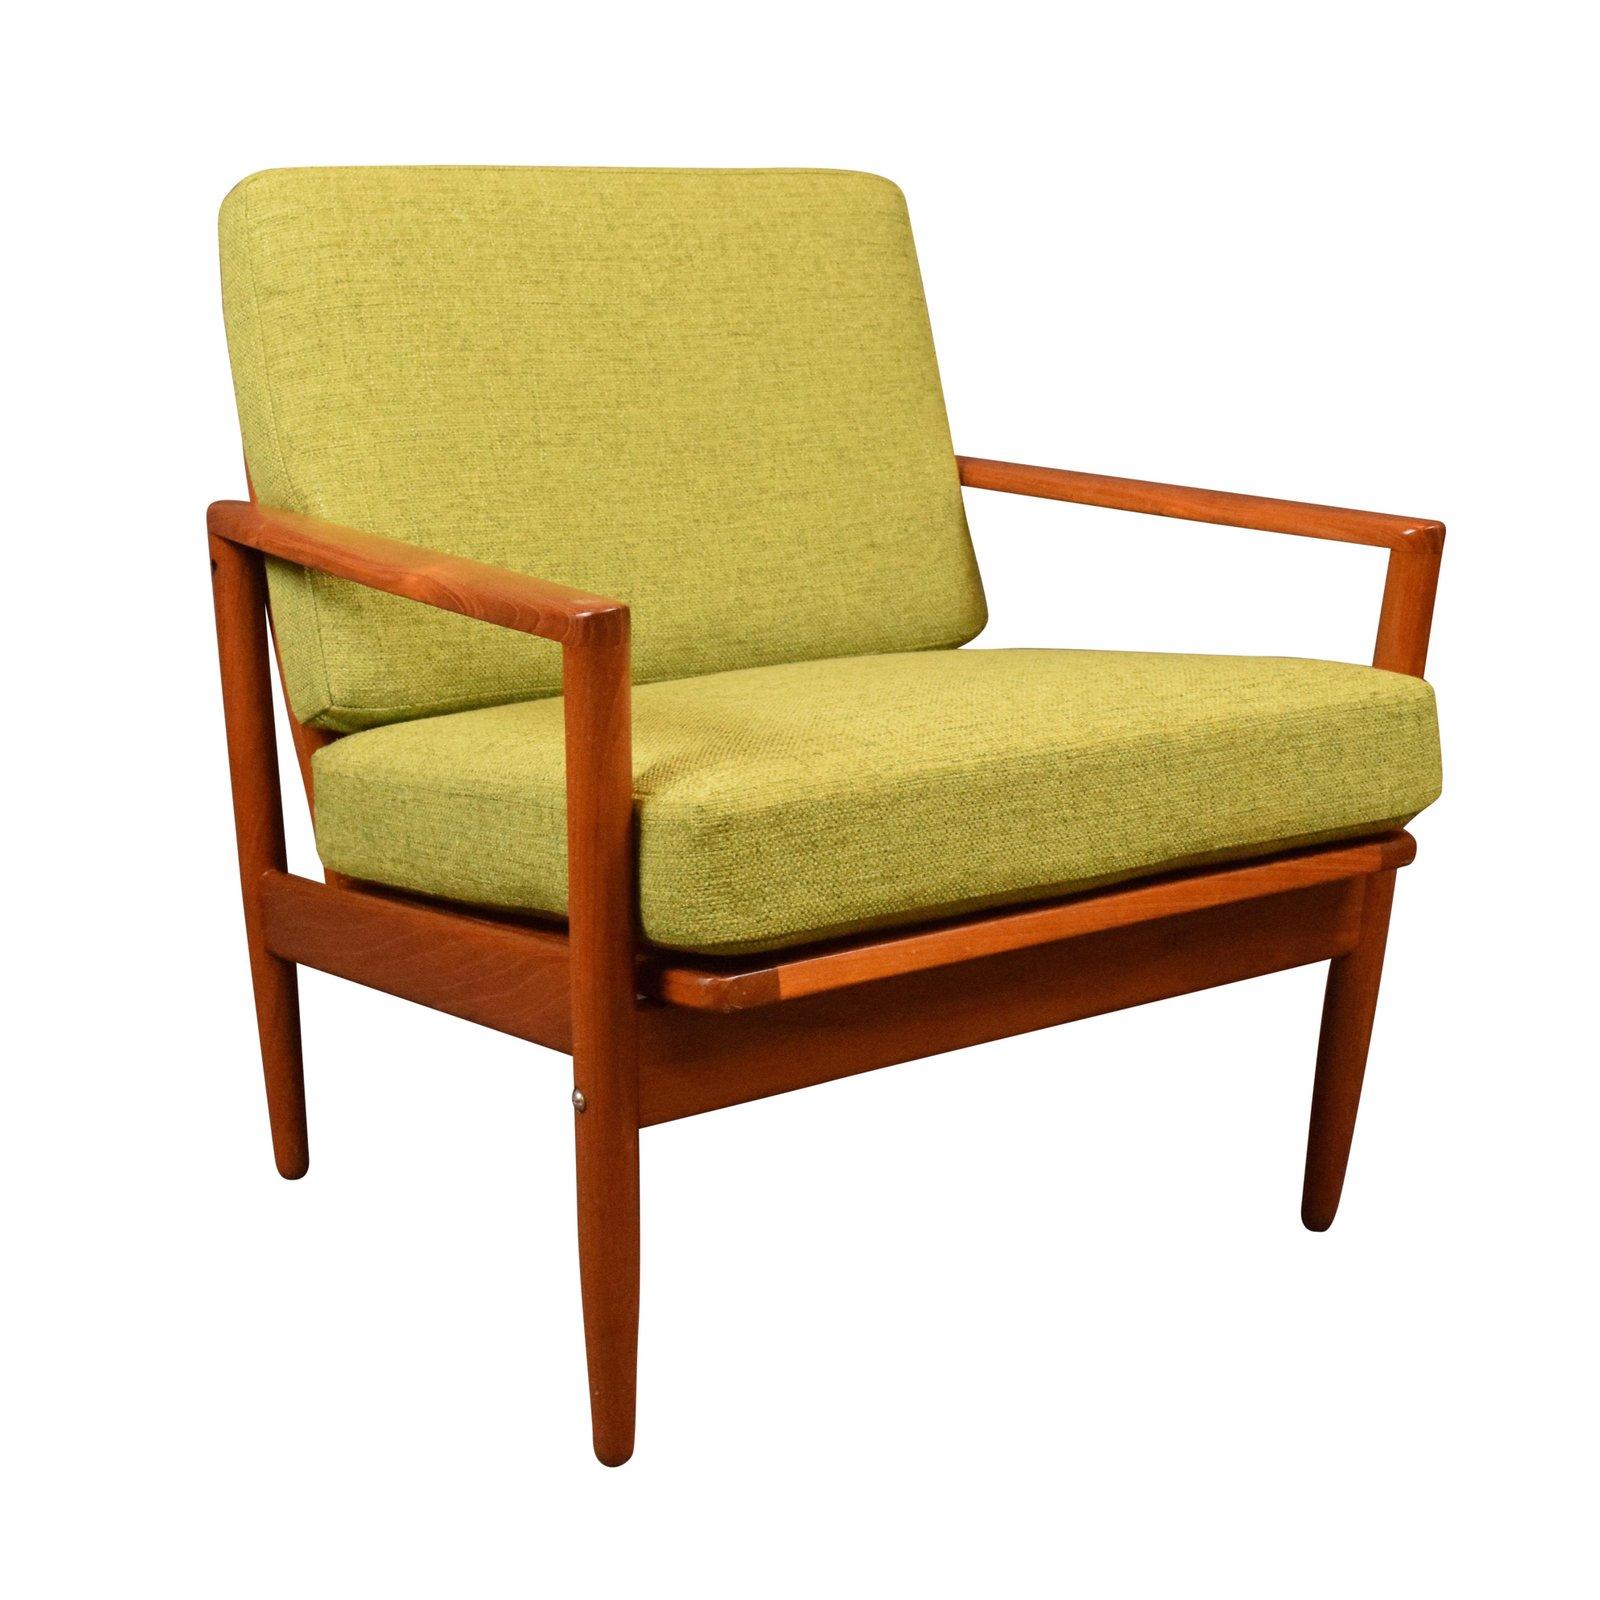 teak lounge chair used banquet covers wholesale vintage danish mid century modern aymerick